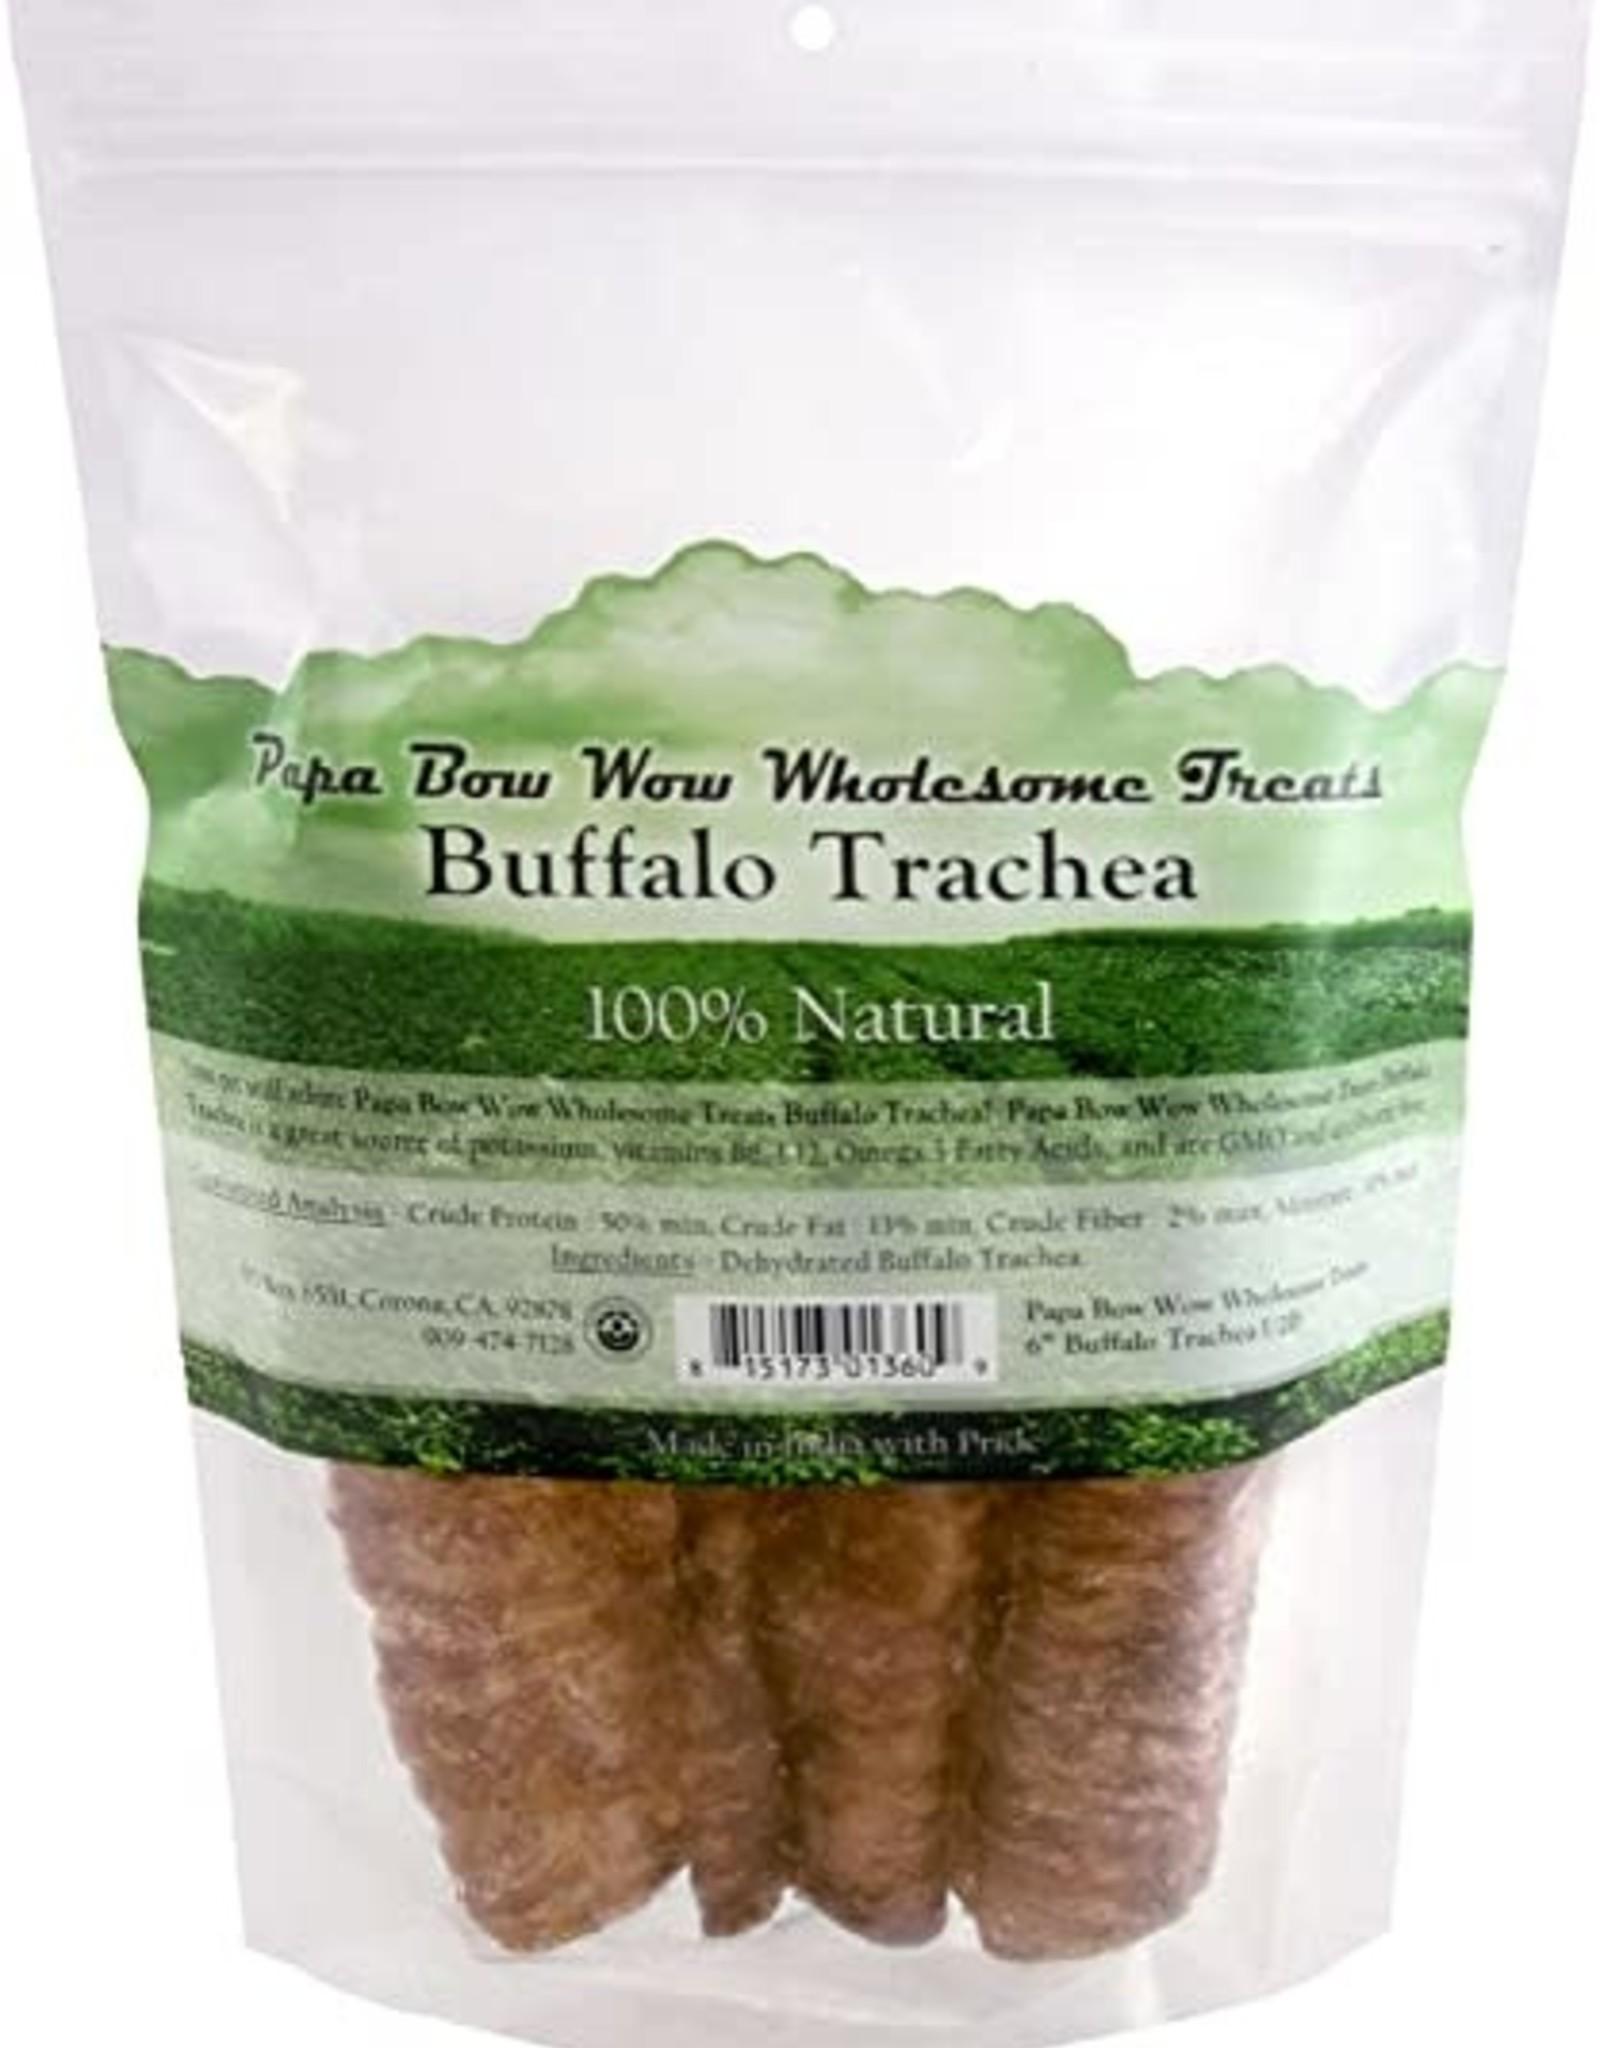 "Papa Bow Wow Papa Bow Wow Buffalo Trachea 6"" - 1/2 lb Bag"